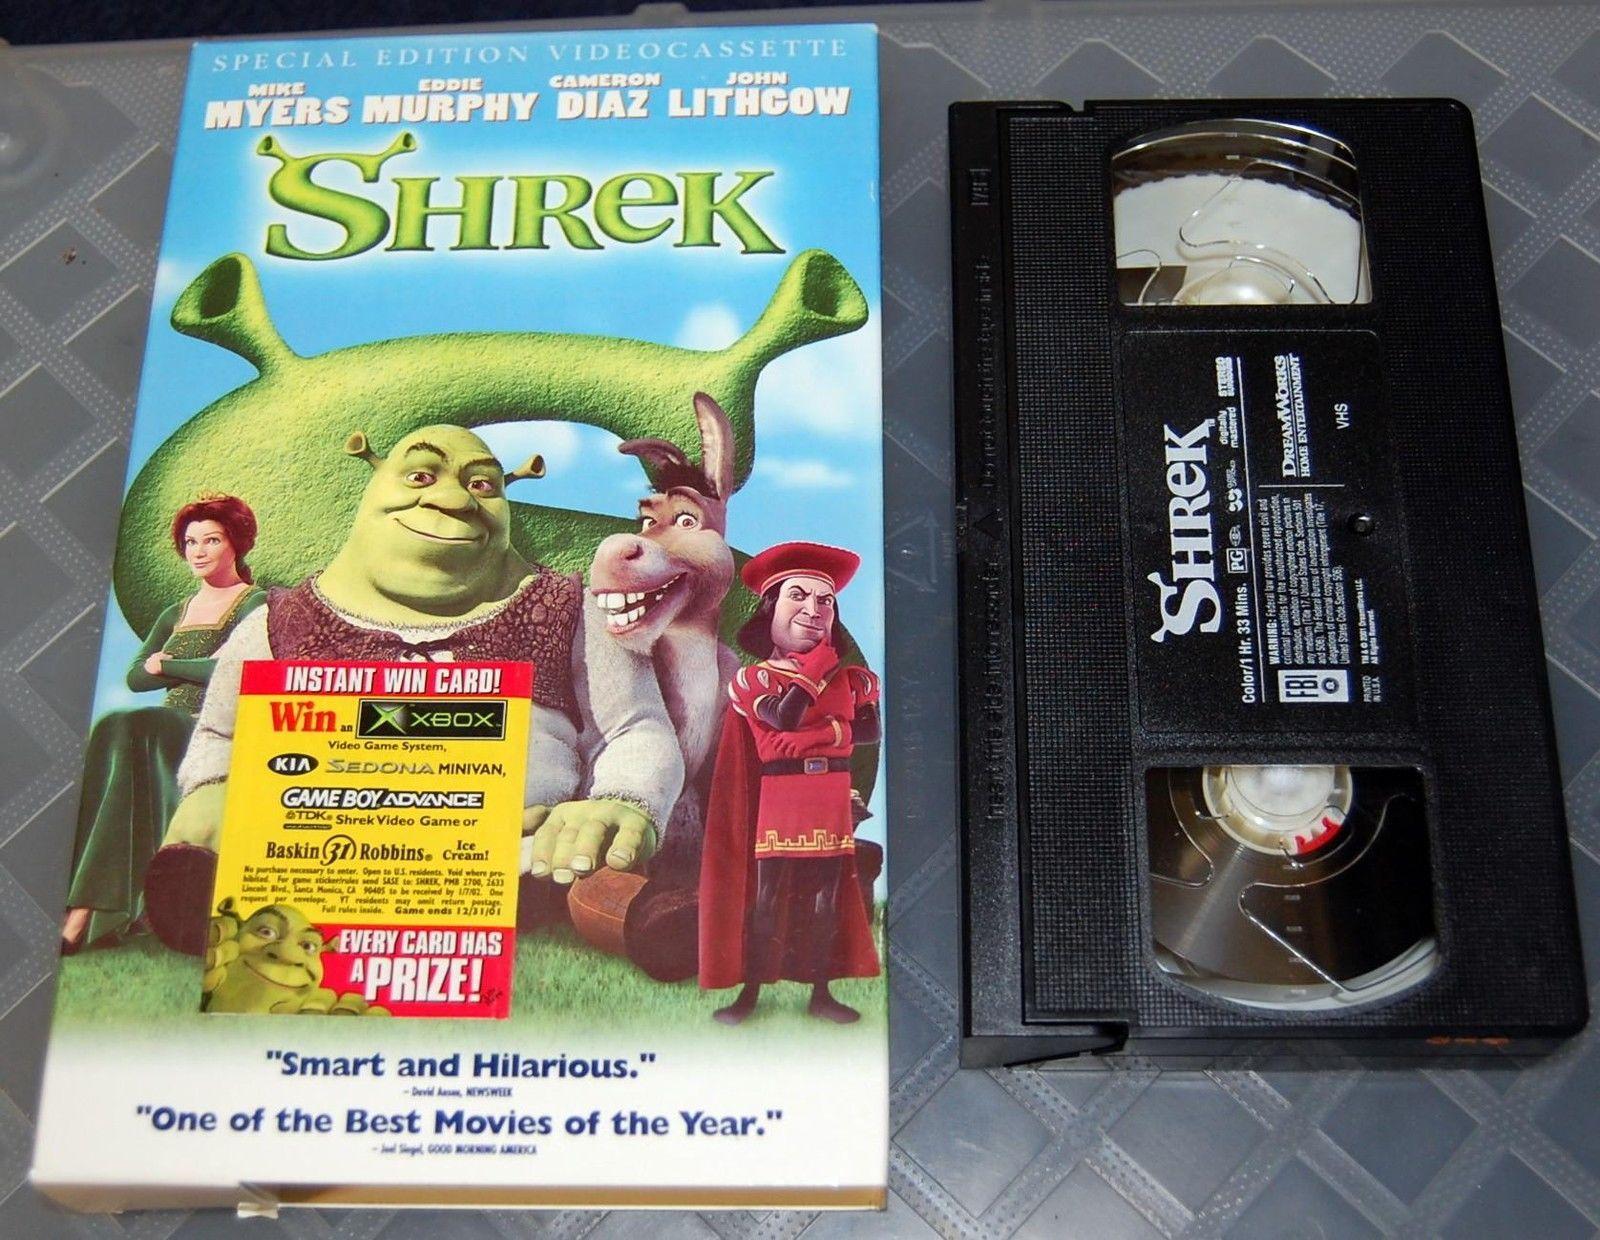 Opening To Shrek 2001 VHS - YouTube